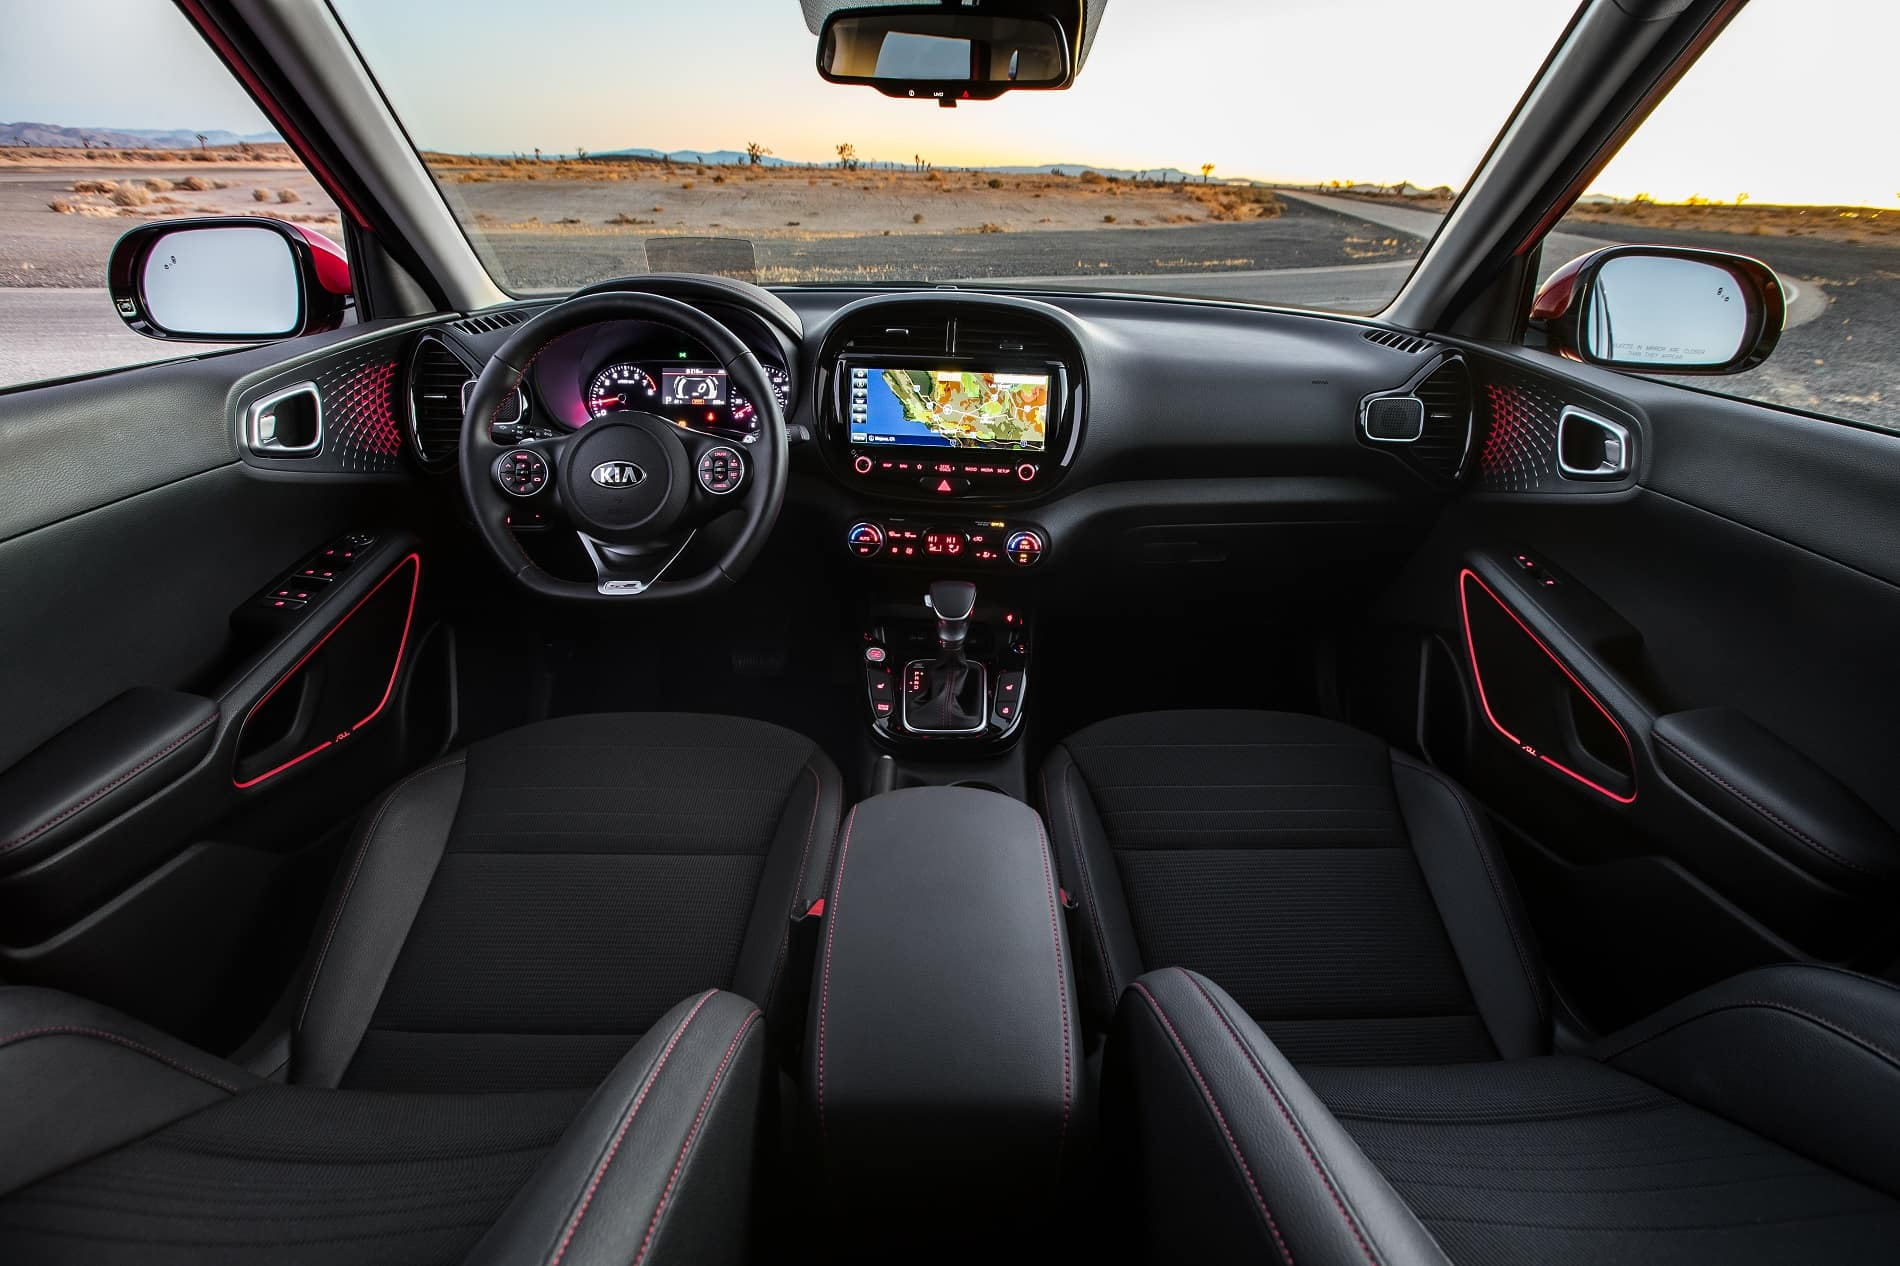 2020 Kia Soul GT Line Interior Room Front Seat Dashboard Technology Infotainment Steering Wheel at Kia of Valencia near Santa Clarita by Los Angeles Metro Area